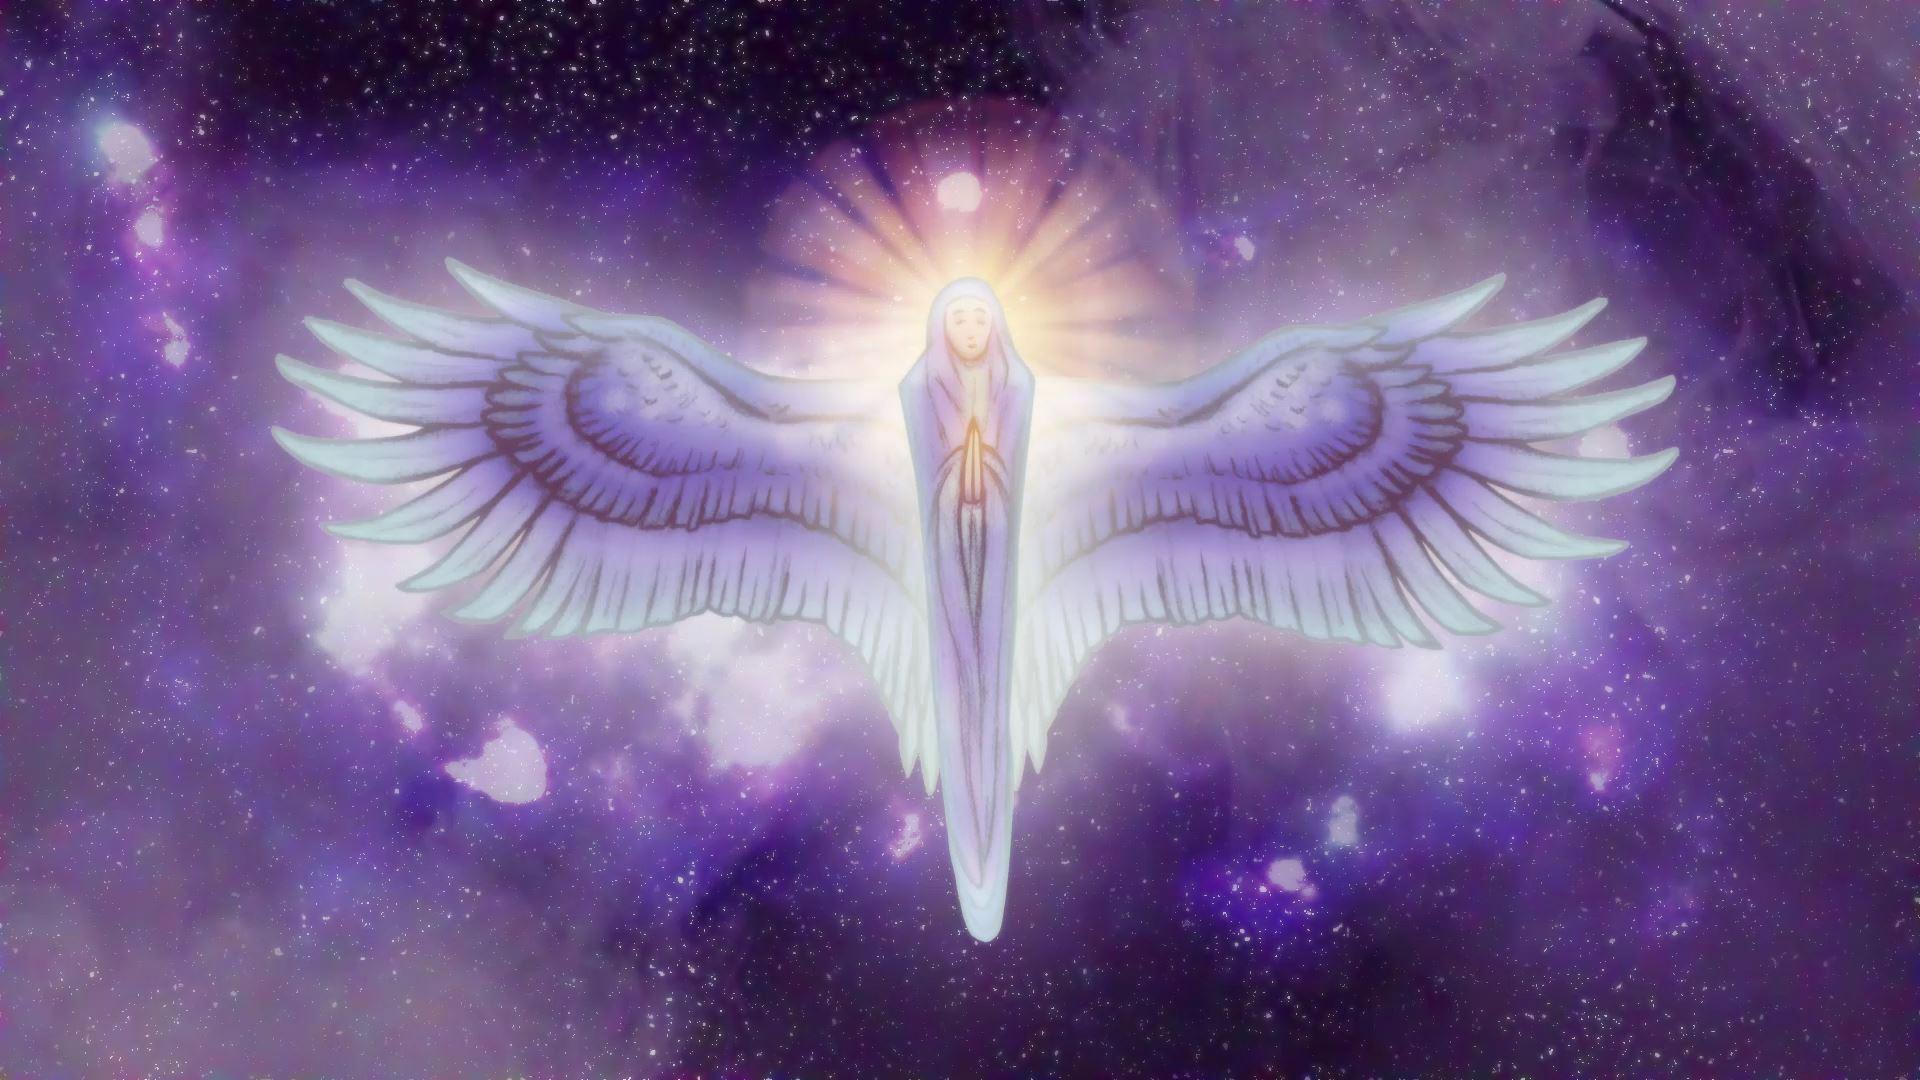 Angelic Being of Light Still frame